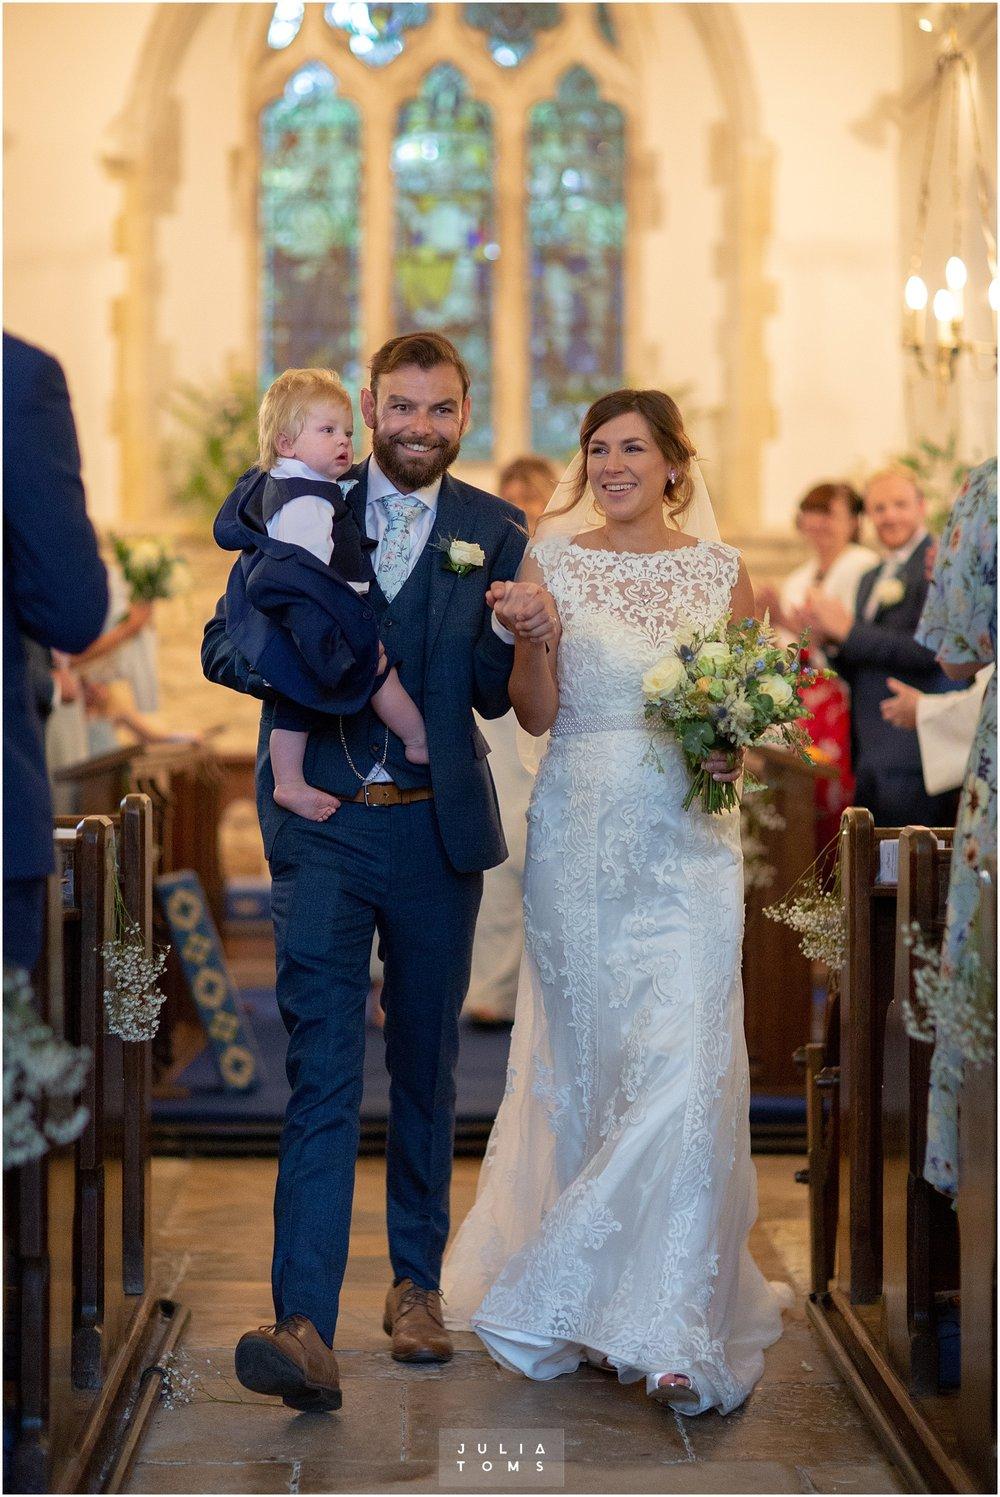 Julia_toms_chichester_wedding_photographer_010.jpg